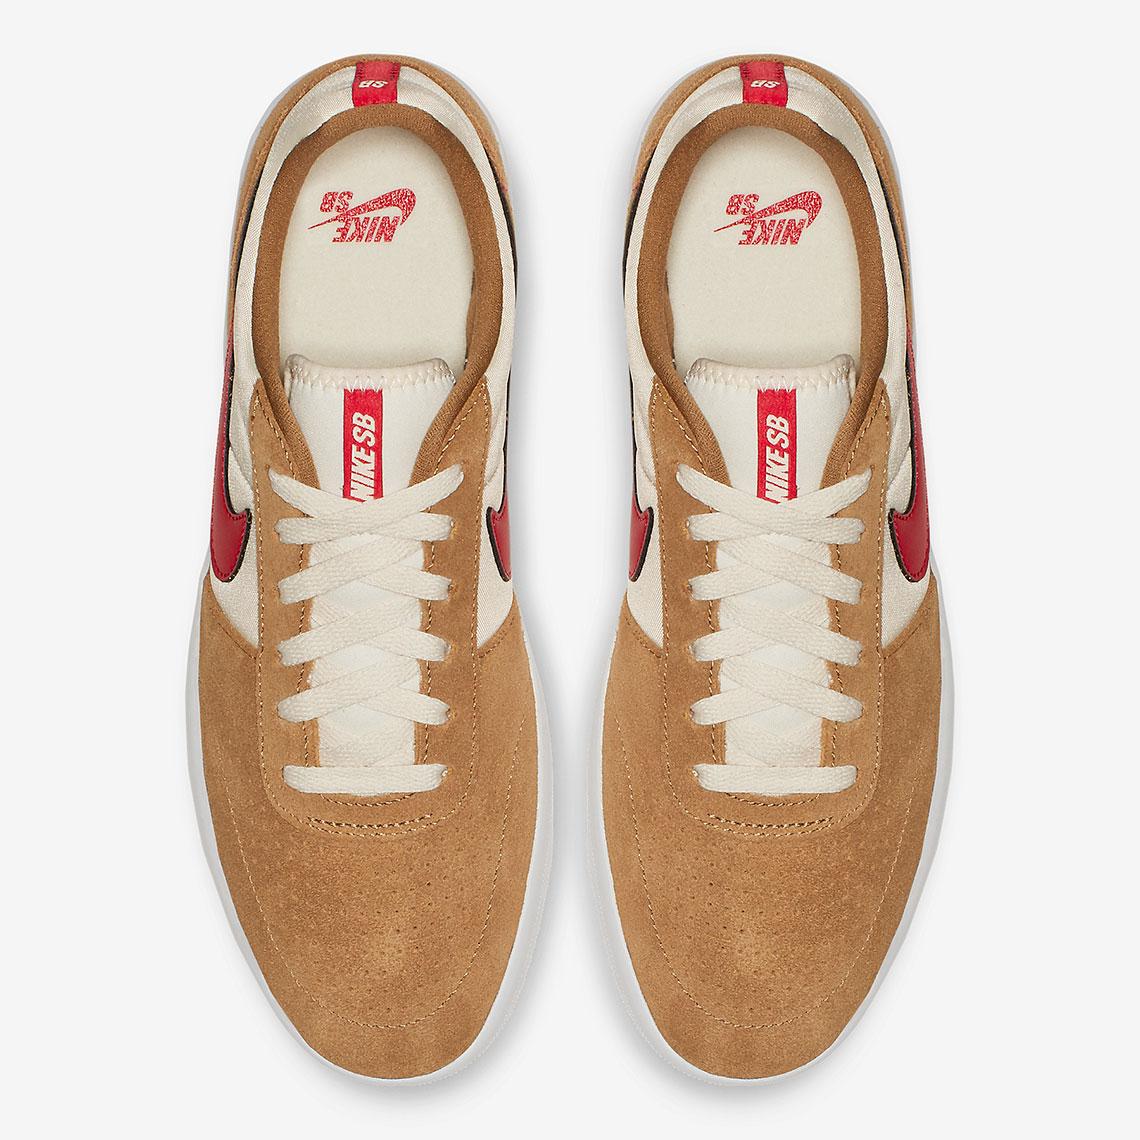 Tom Sachs Nike SB Team Classic Skate